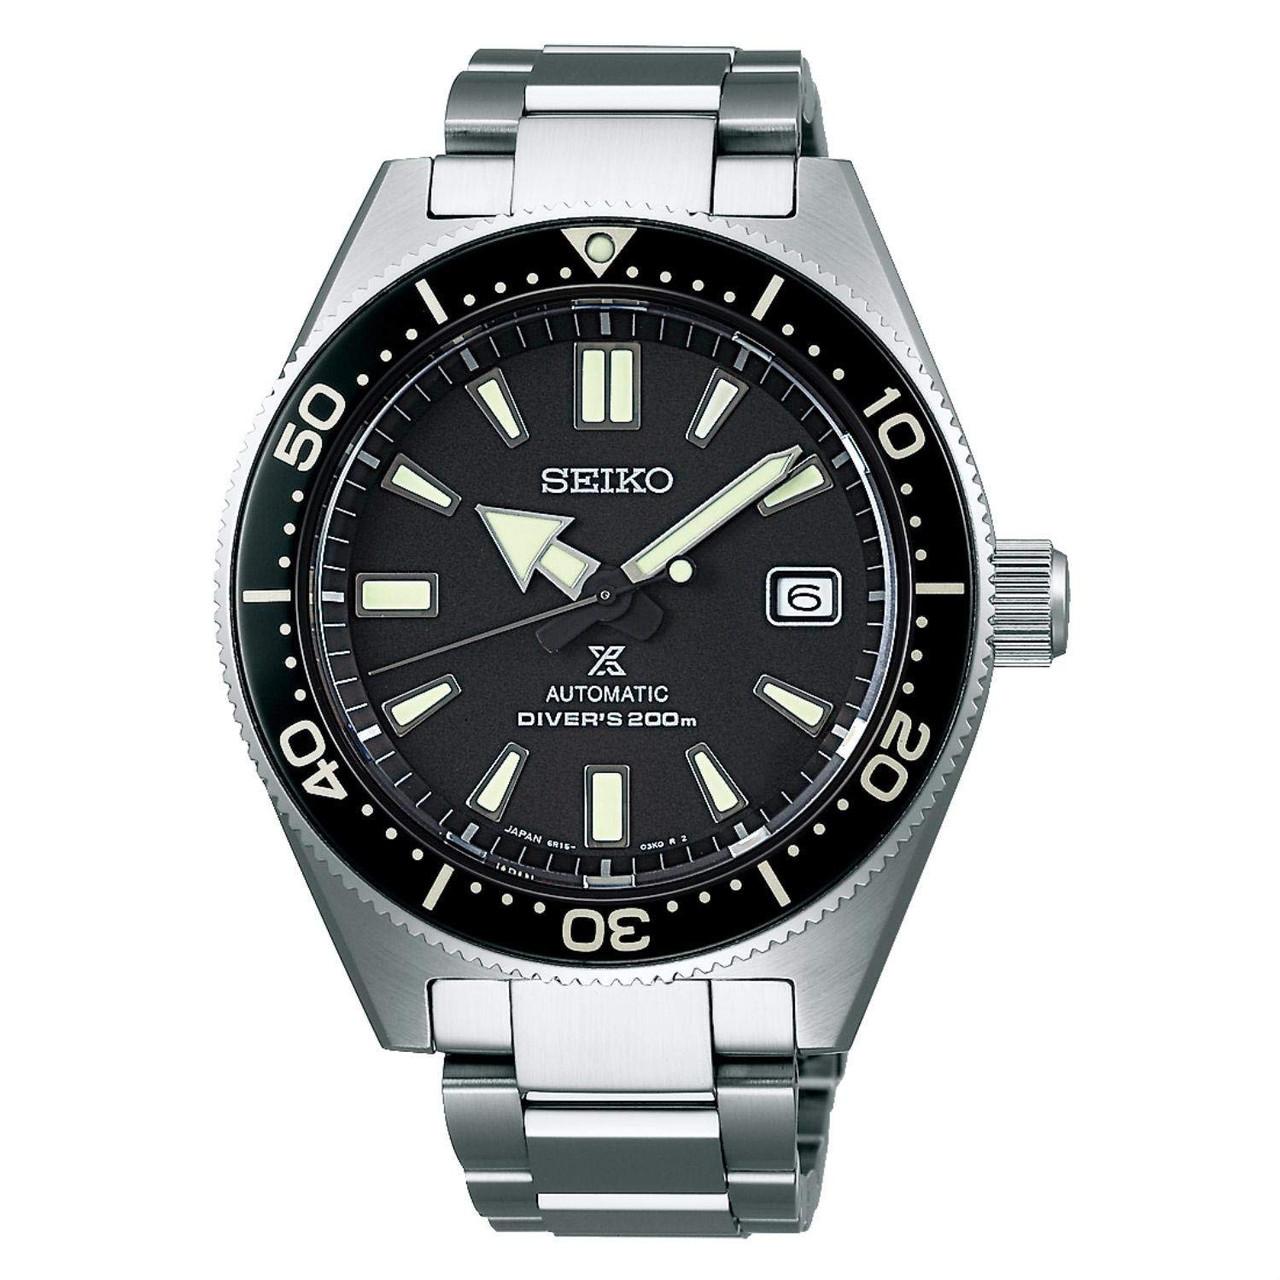 Seiko SPB051 Prospex Diver 62MAS Reedition (SBDC051)